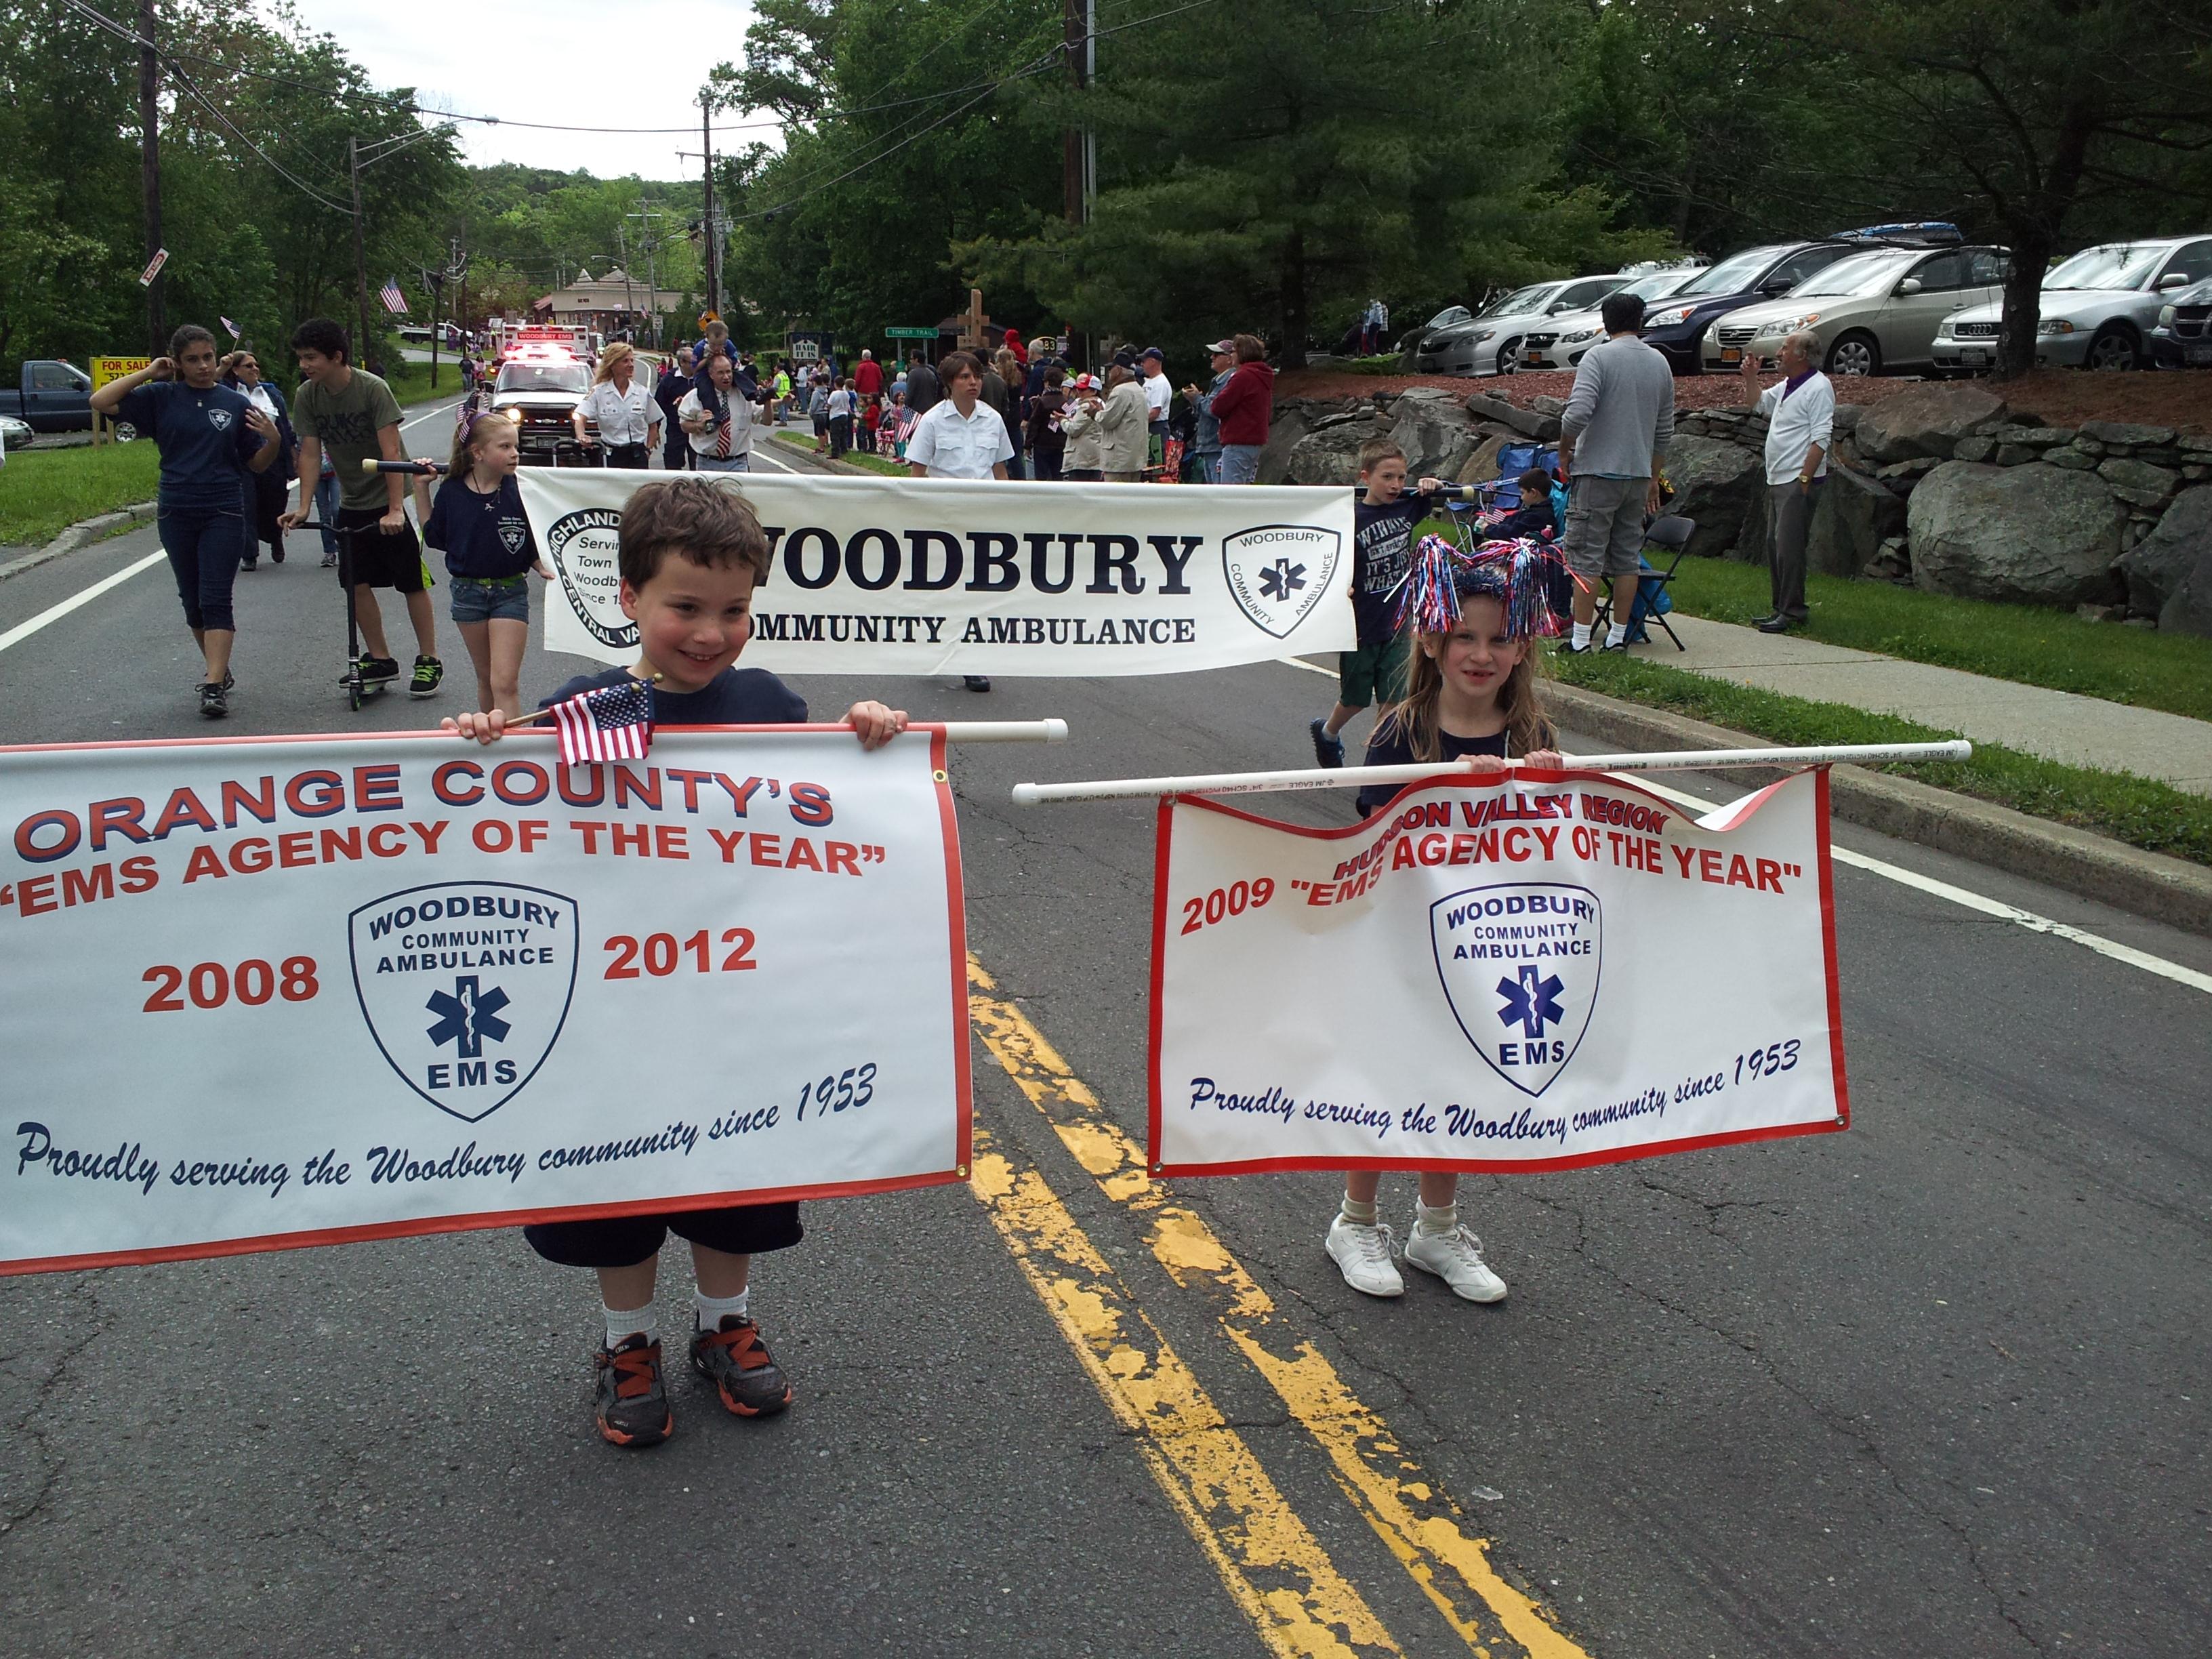 Woodbury EMS                                                   000